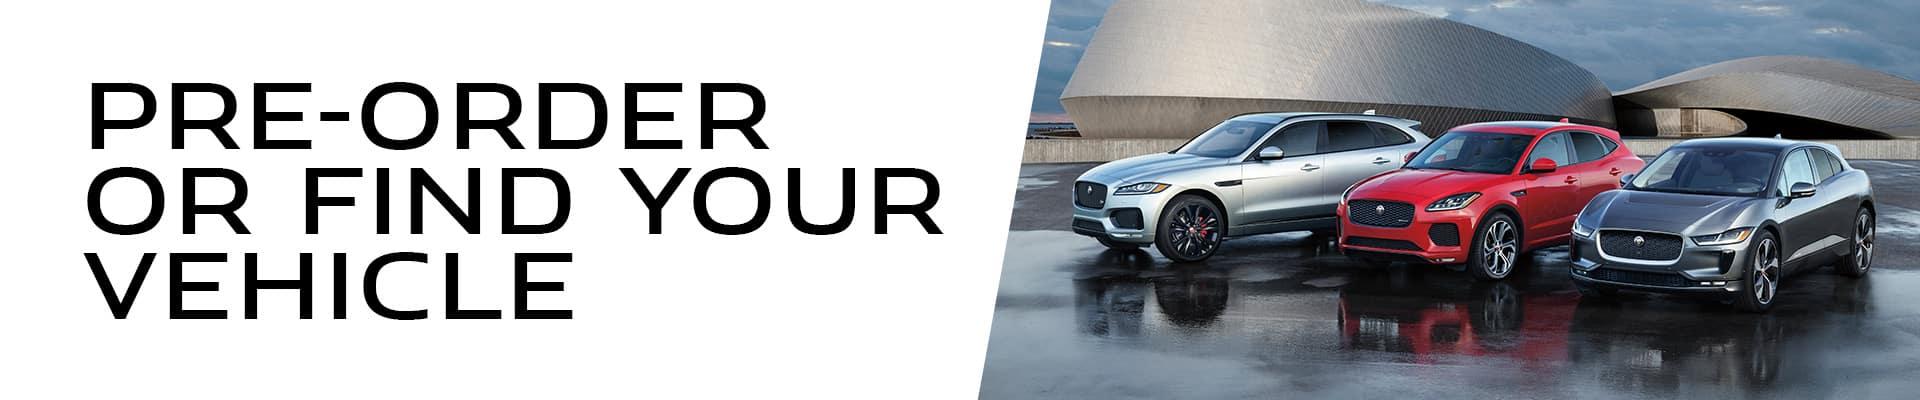 Pre-Order or Find Your Vehicle at Jaguar of Naperville near Naperville, IL